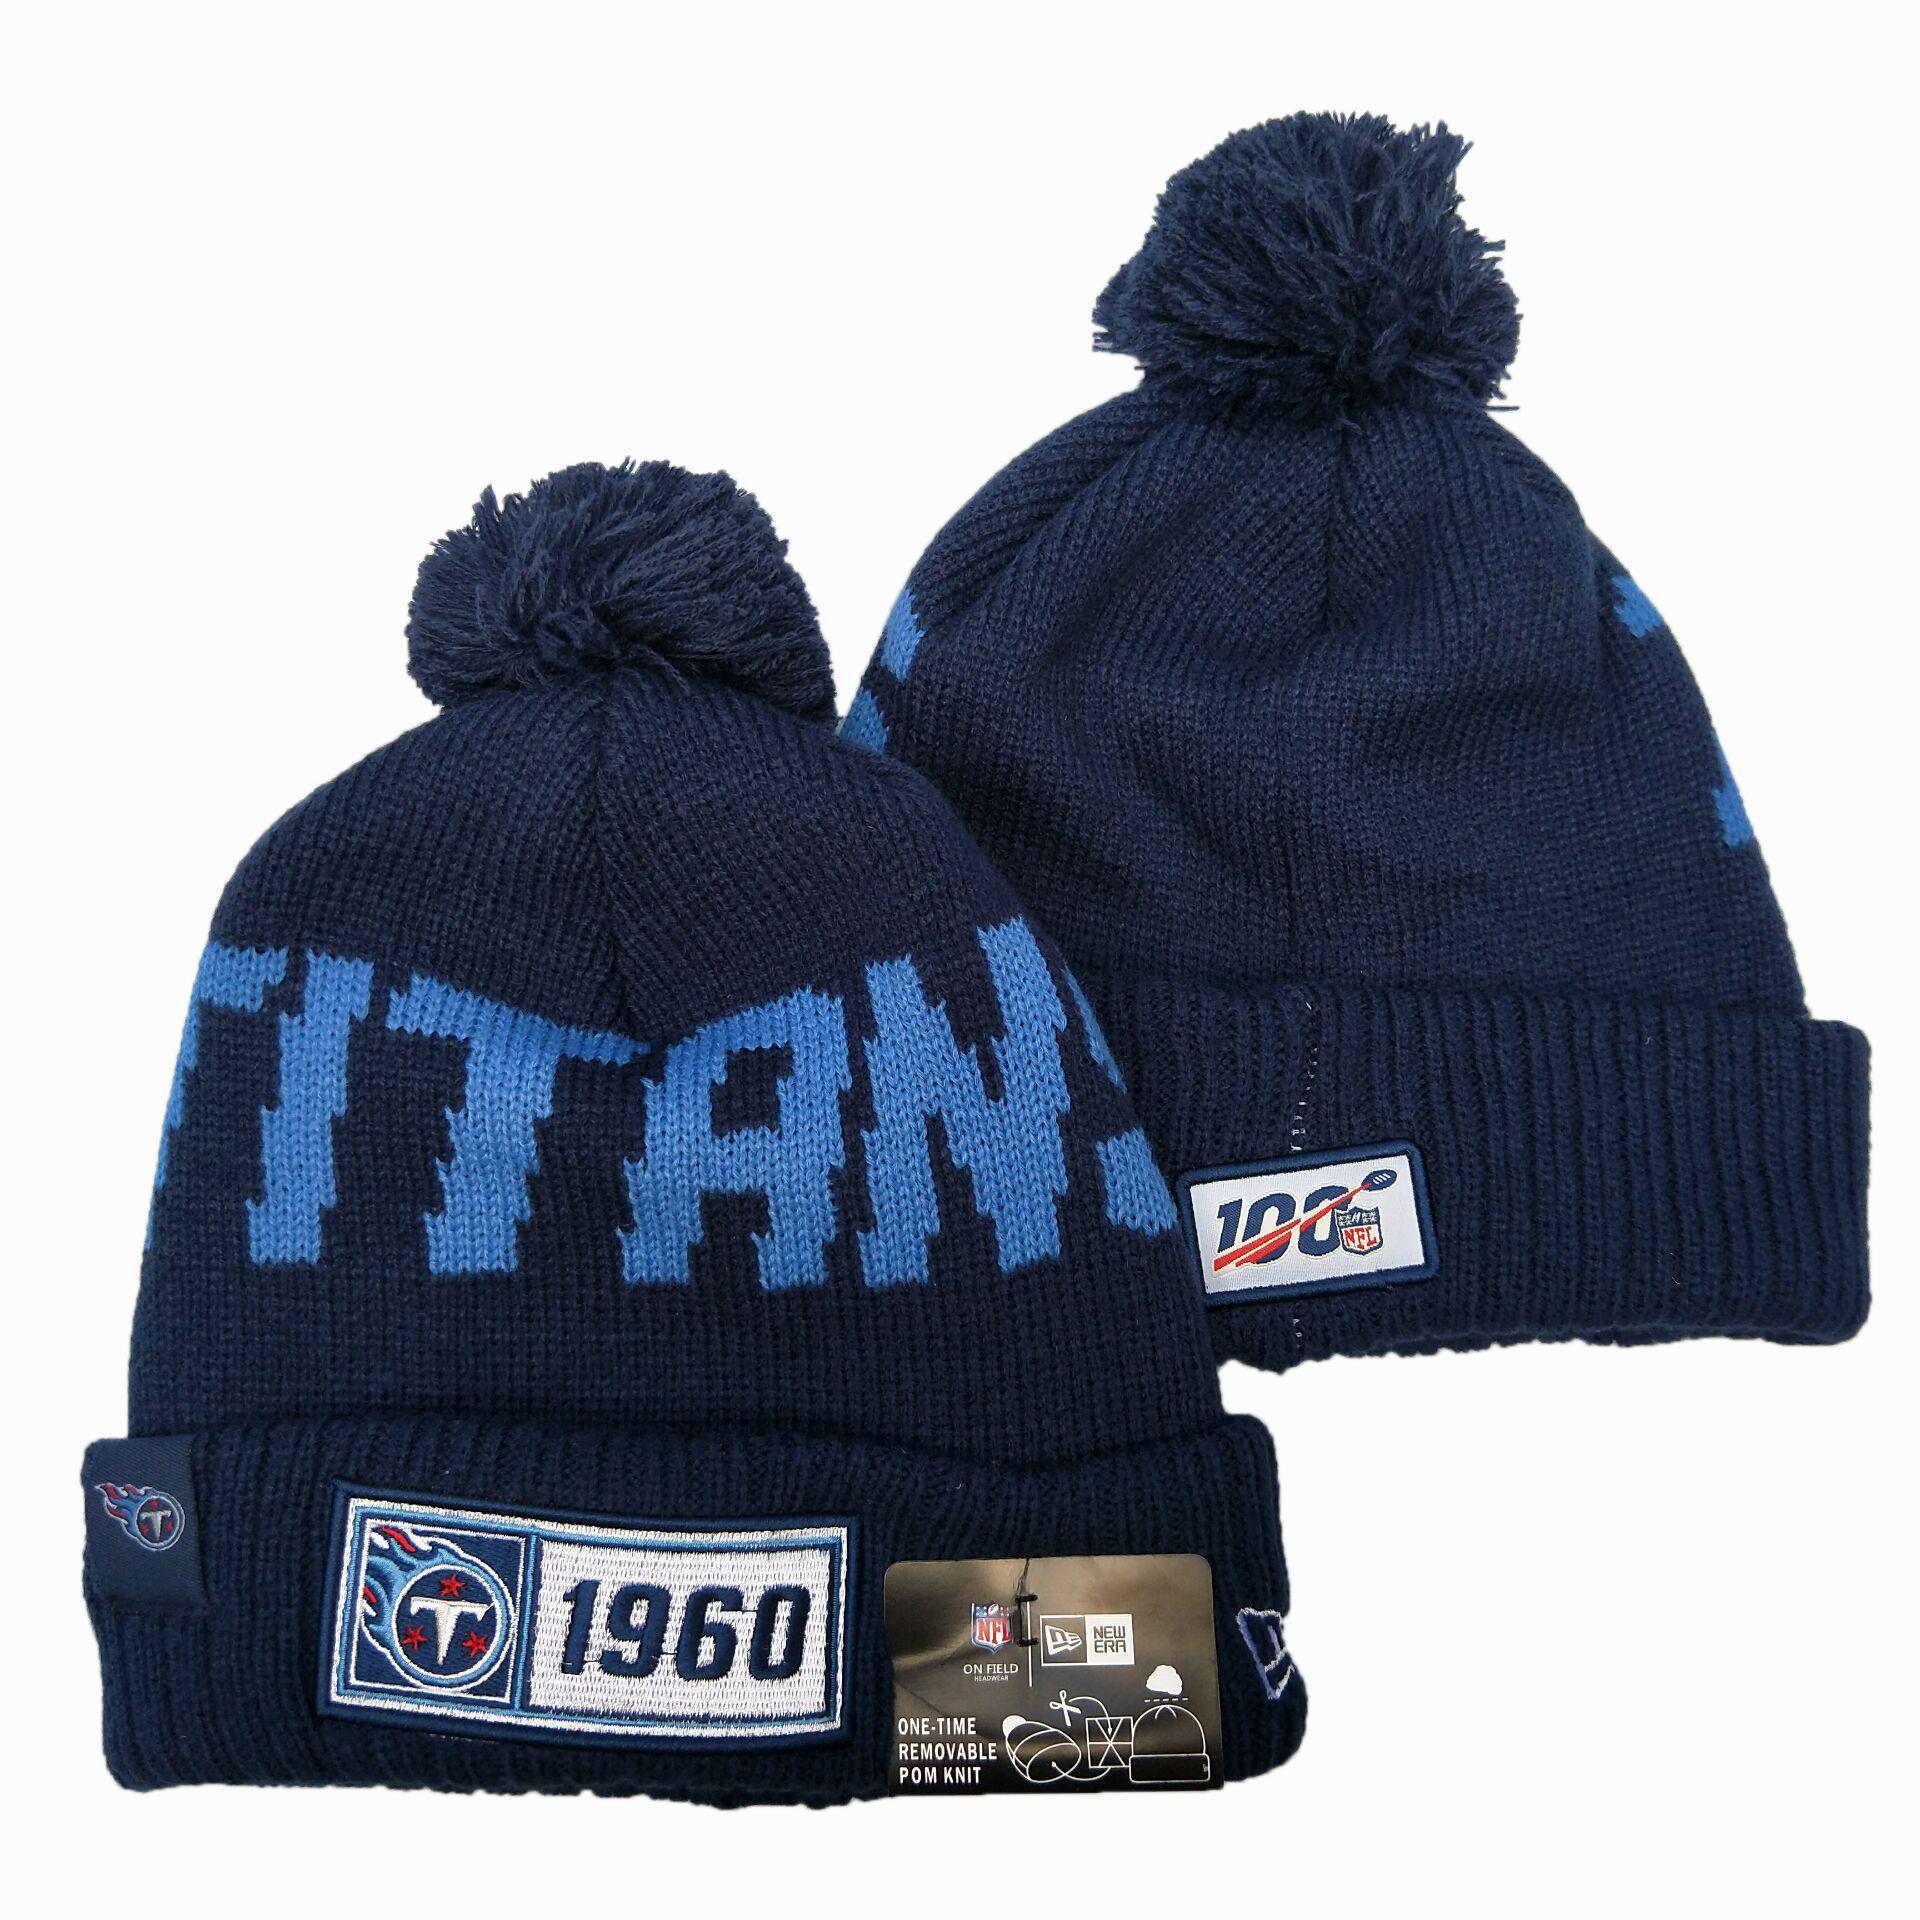 Titans Team Logo Navy 100th Season Pom Knit Hat YD